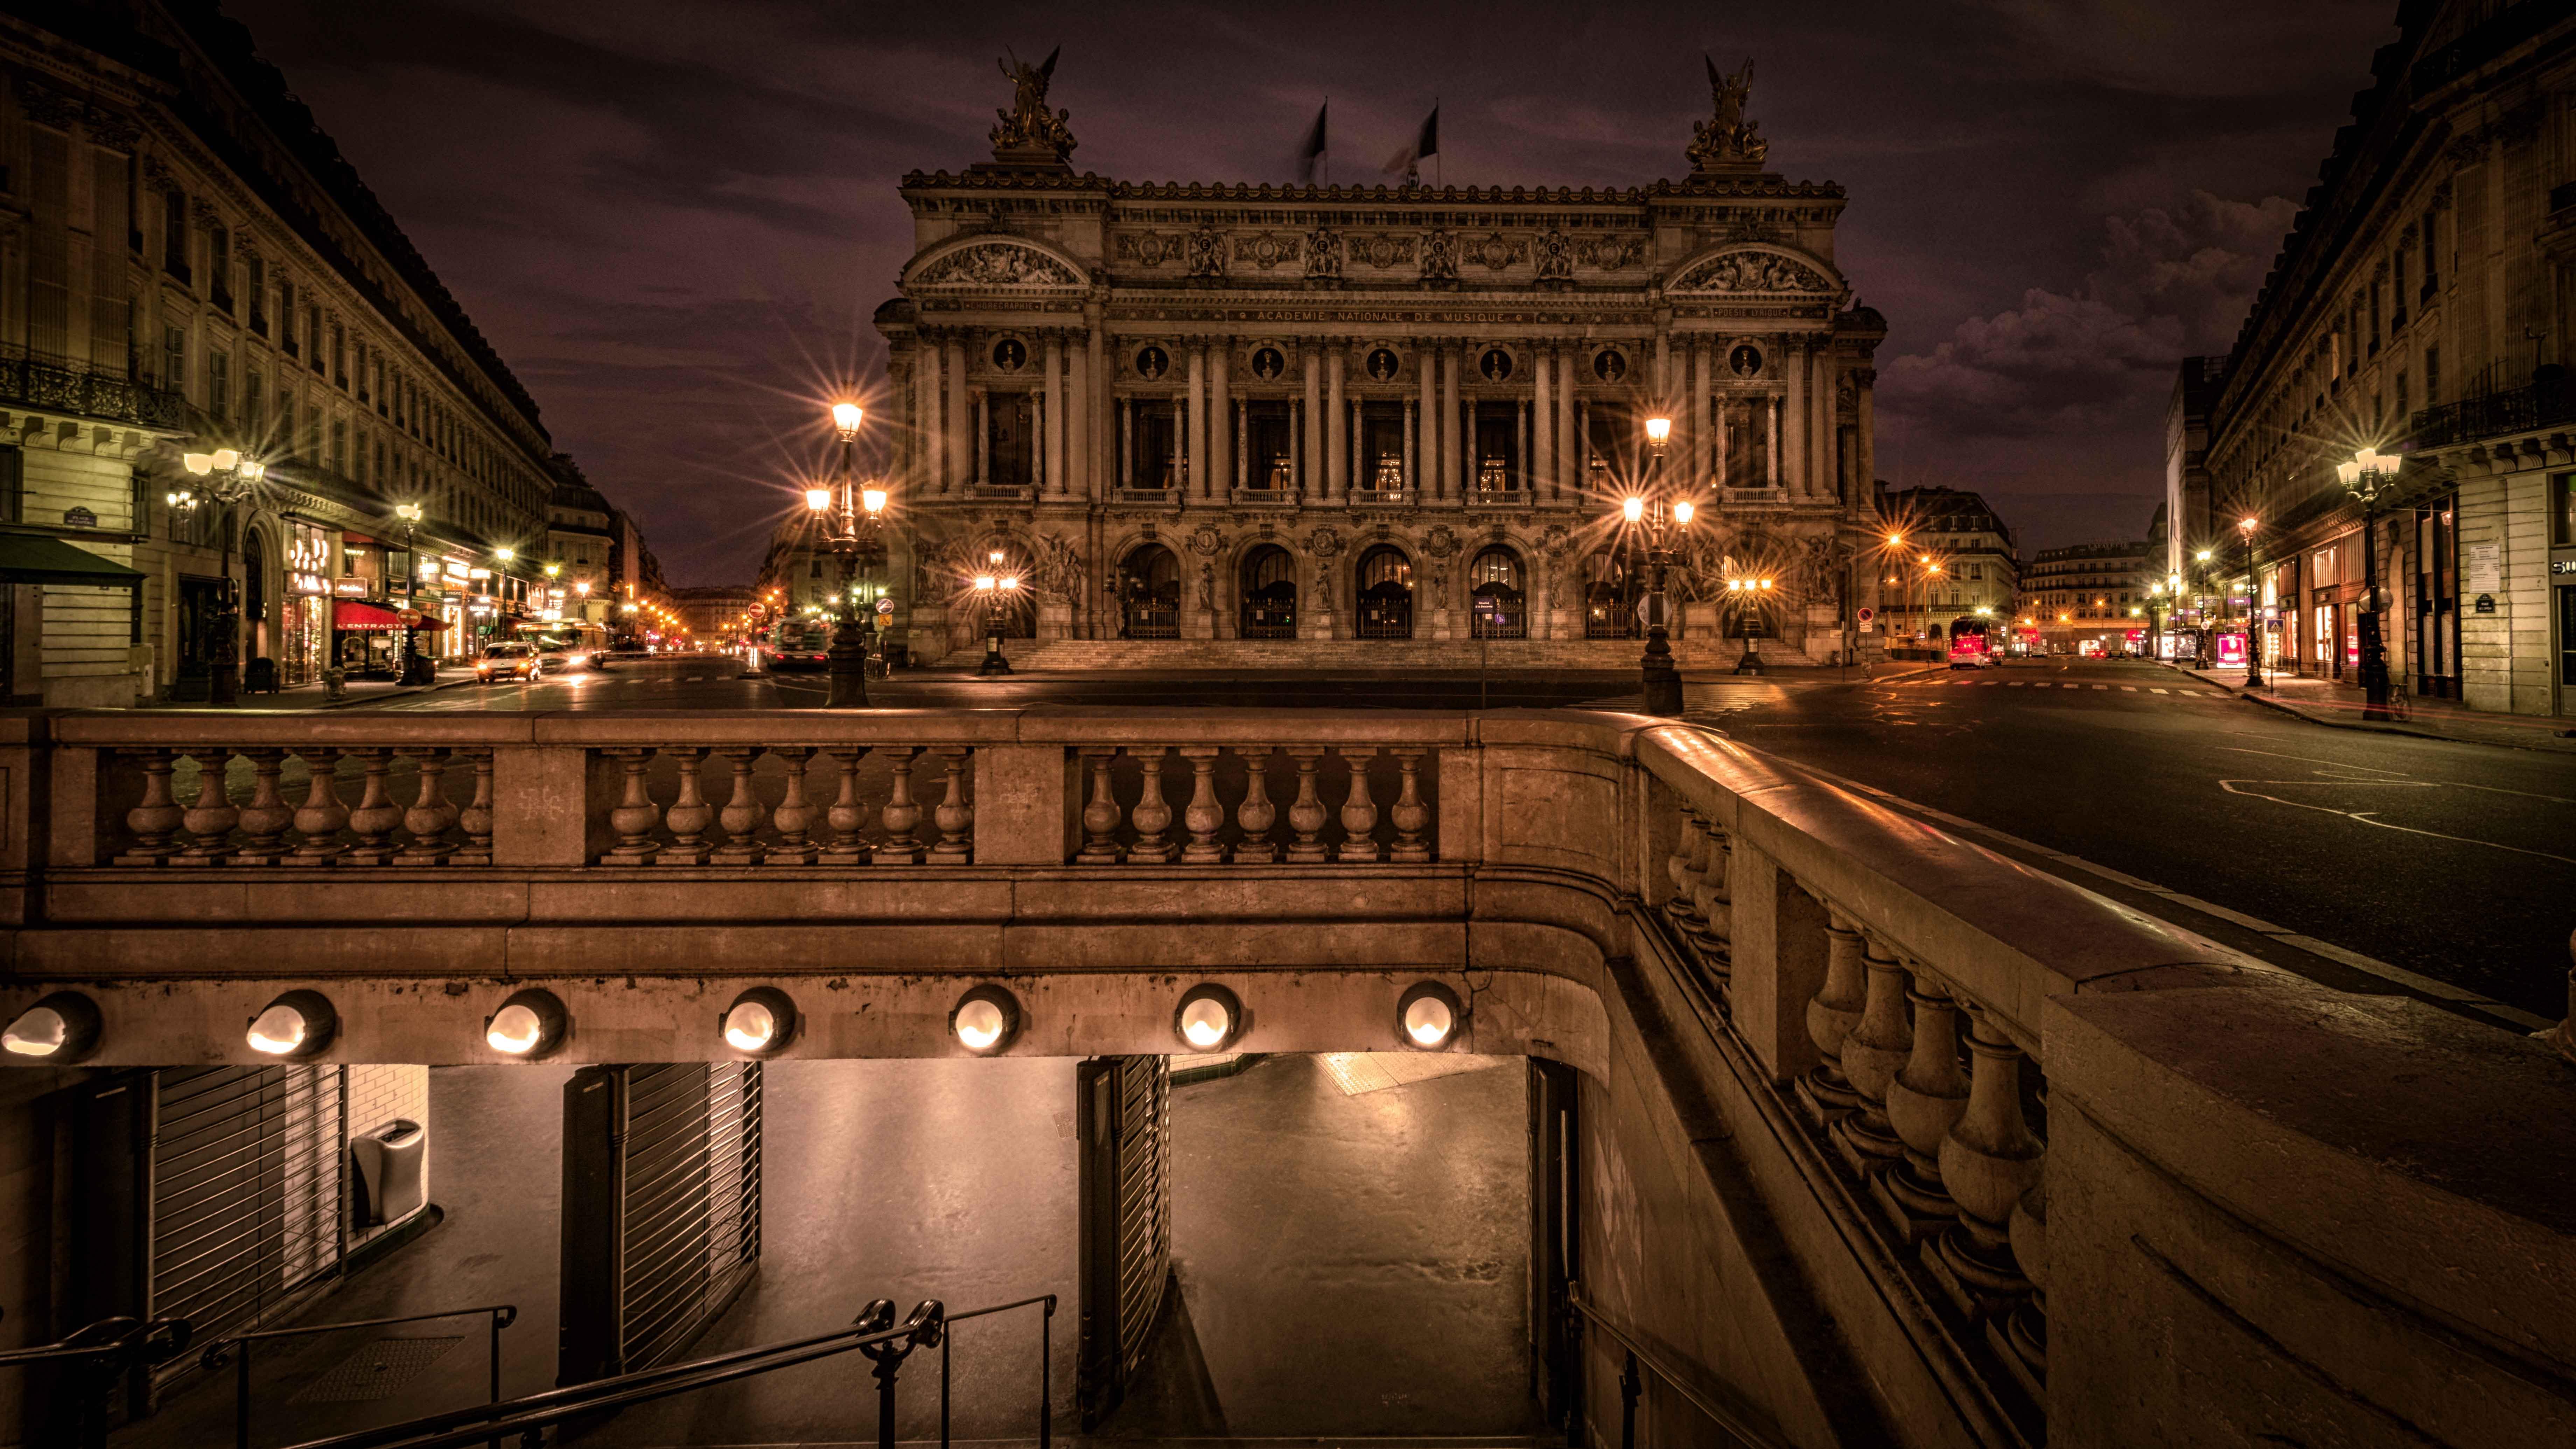 Night Photography Workshop